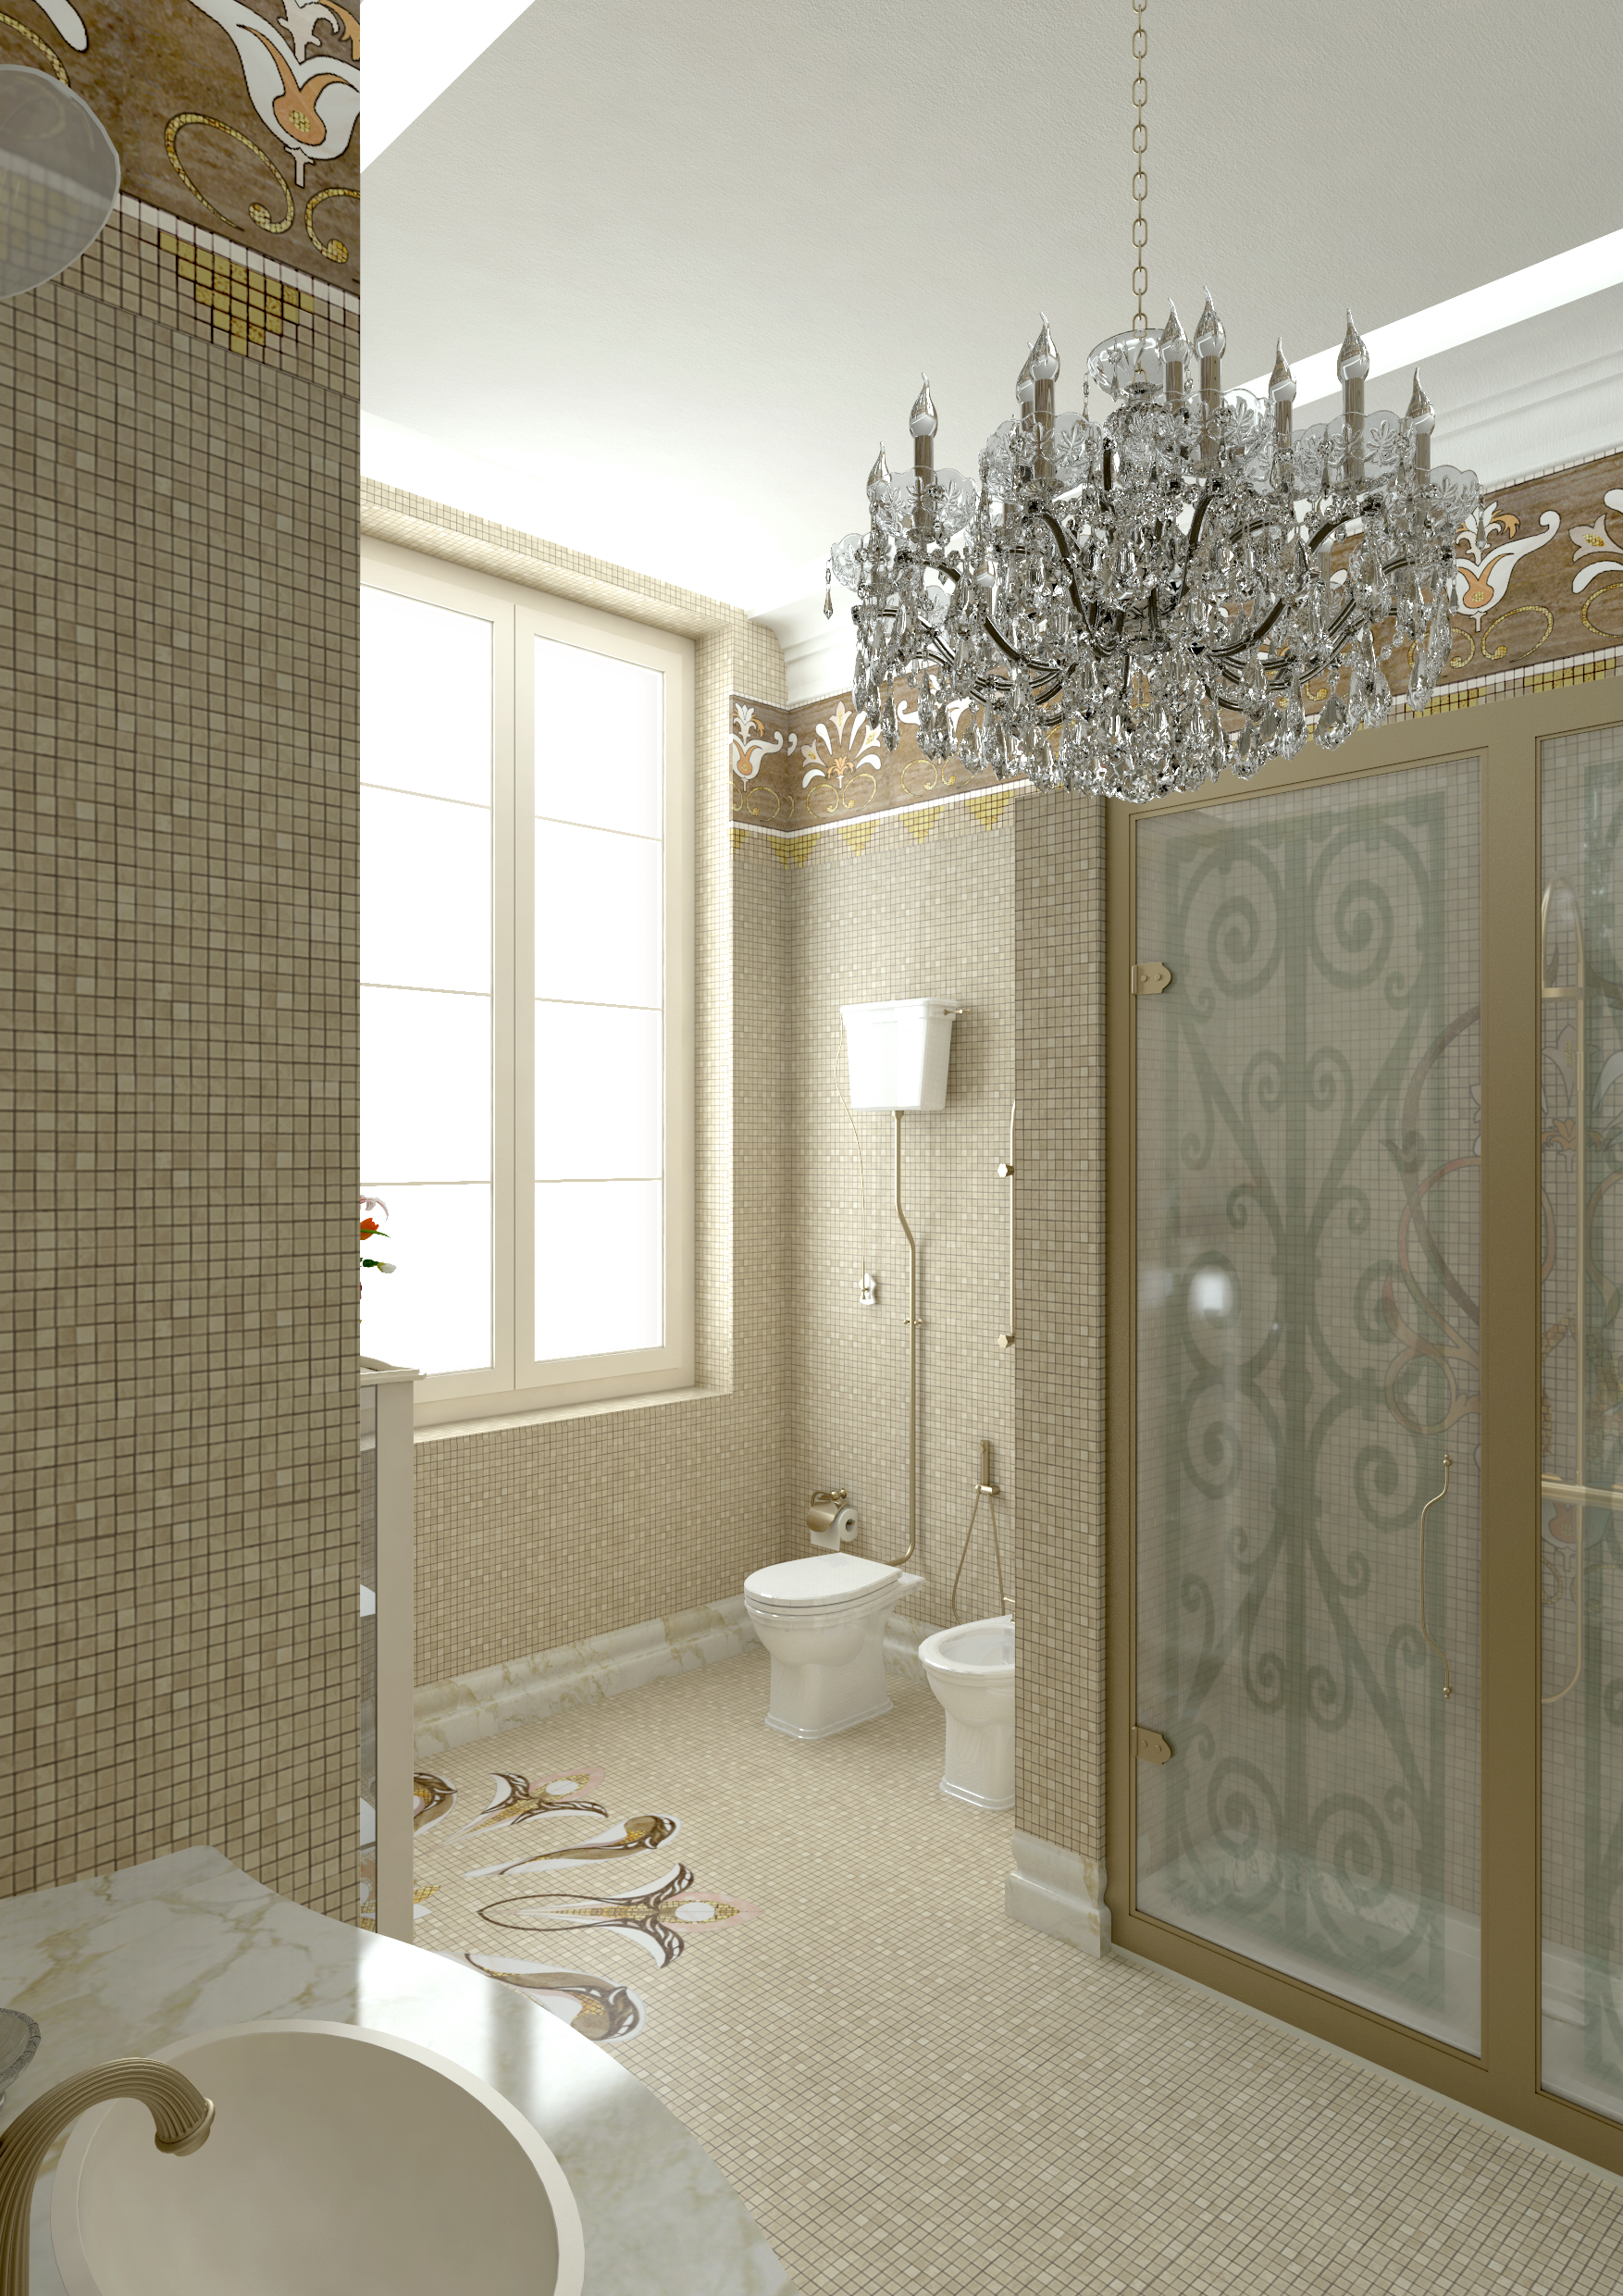 Bathroom T 10 Img001 Mosaico #Bathroom #Massimotrezziforniture Project By Massimo Trezzi Forniture